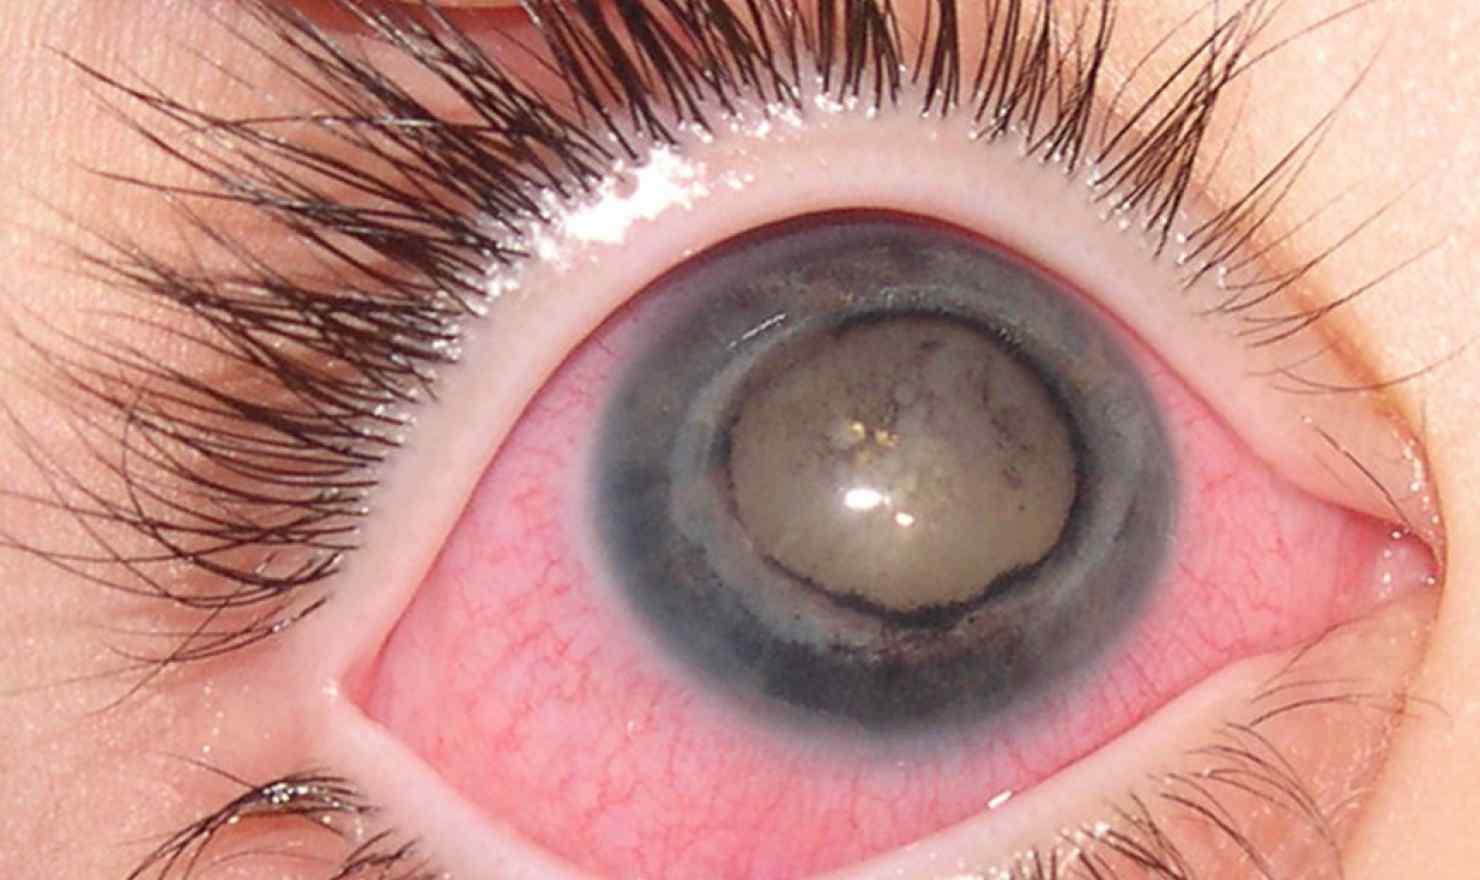 International Glaucome Association - Sight Warnings